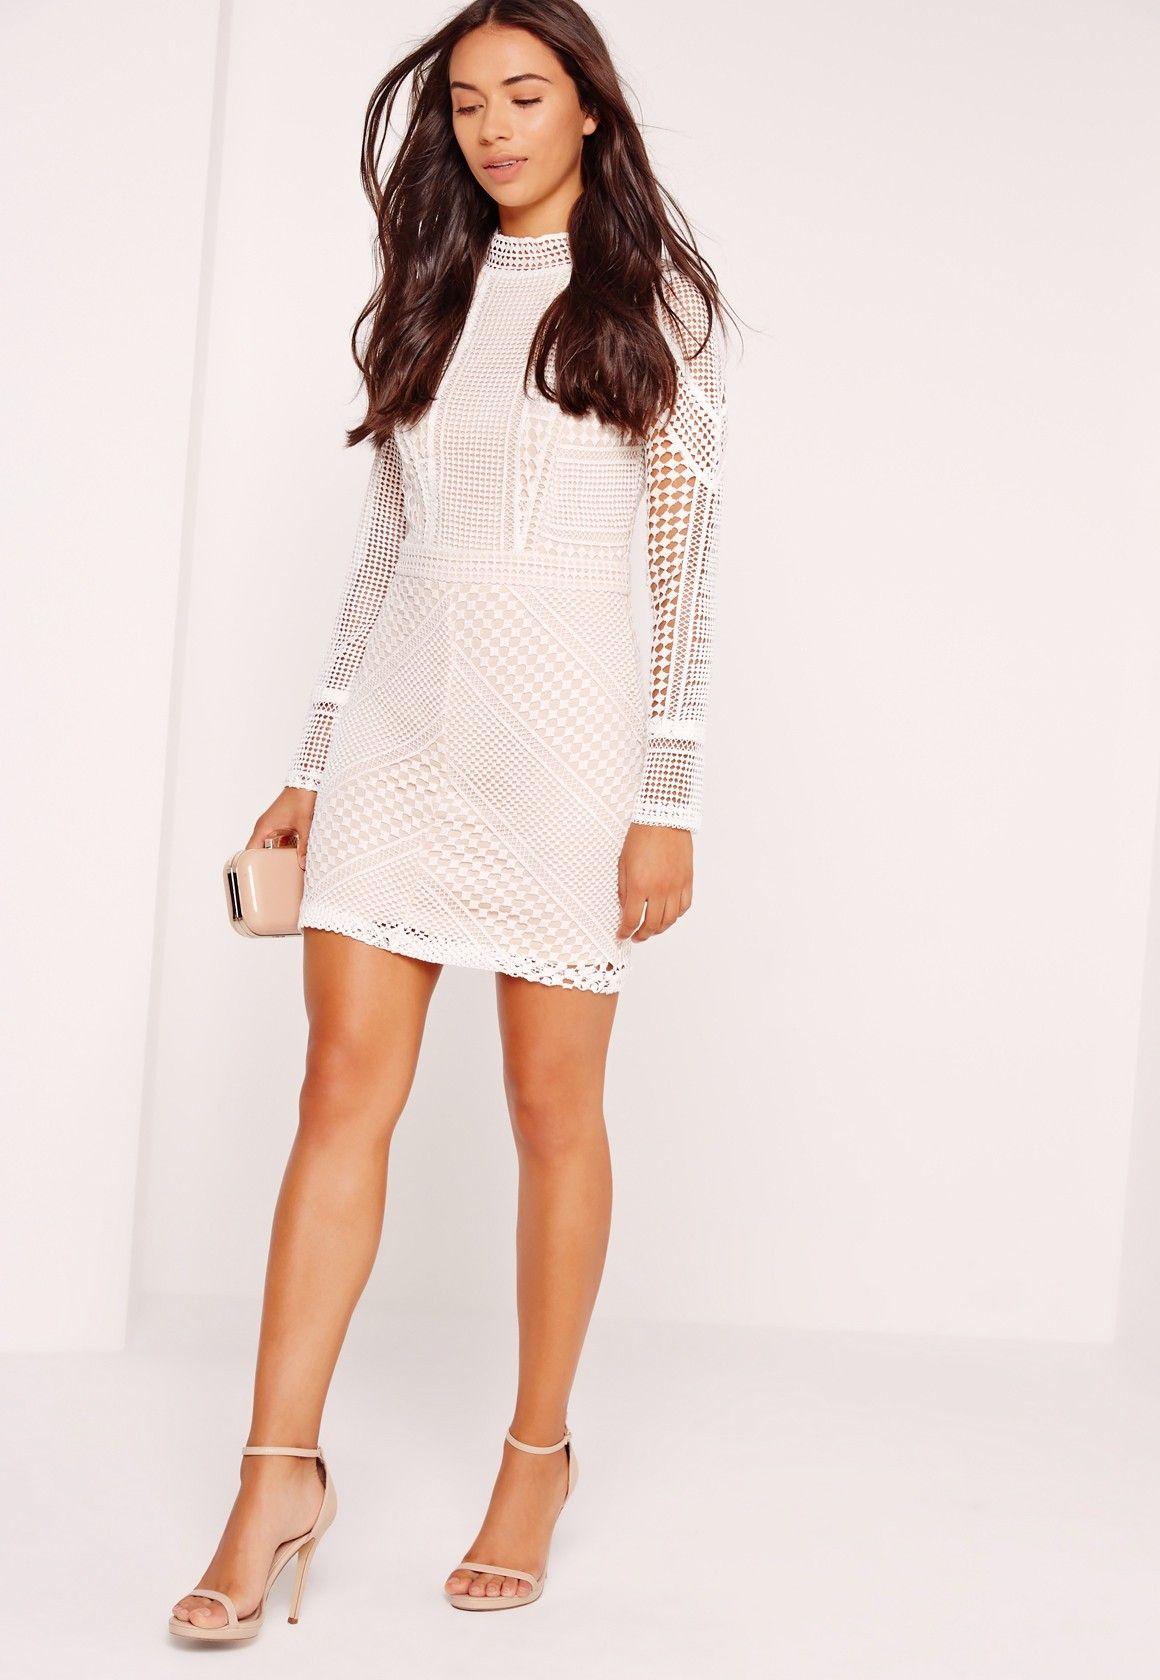 536fd14f1683 Missguided - Premium Structured High Neck Lace Mini Dress White ...